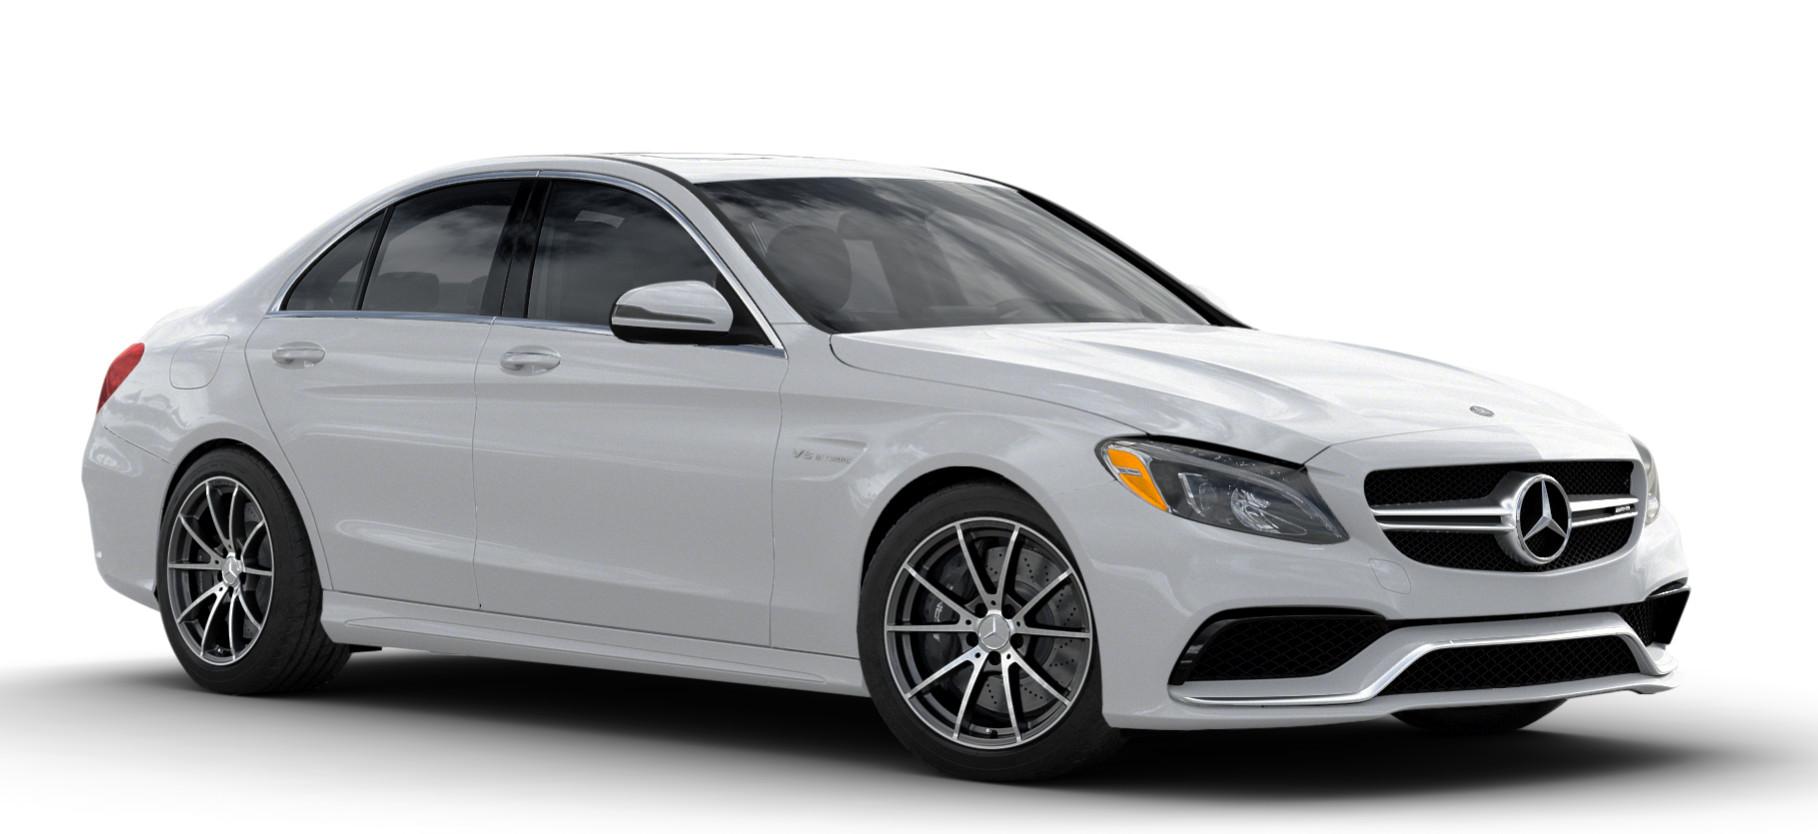 C class mercedes benz vehicles recalled for Mercedes benz c300 recalls